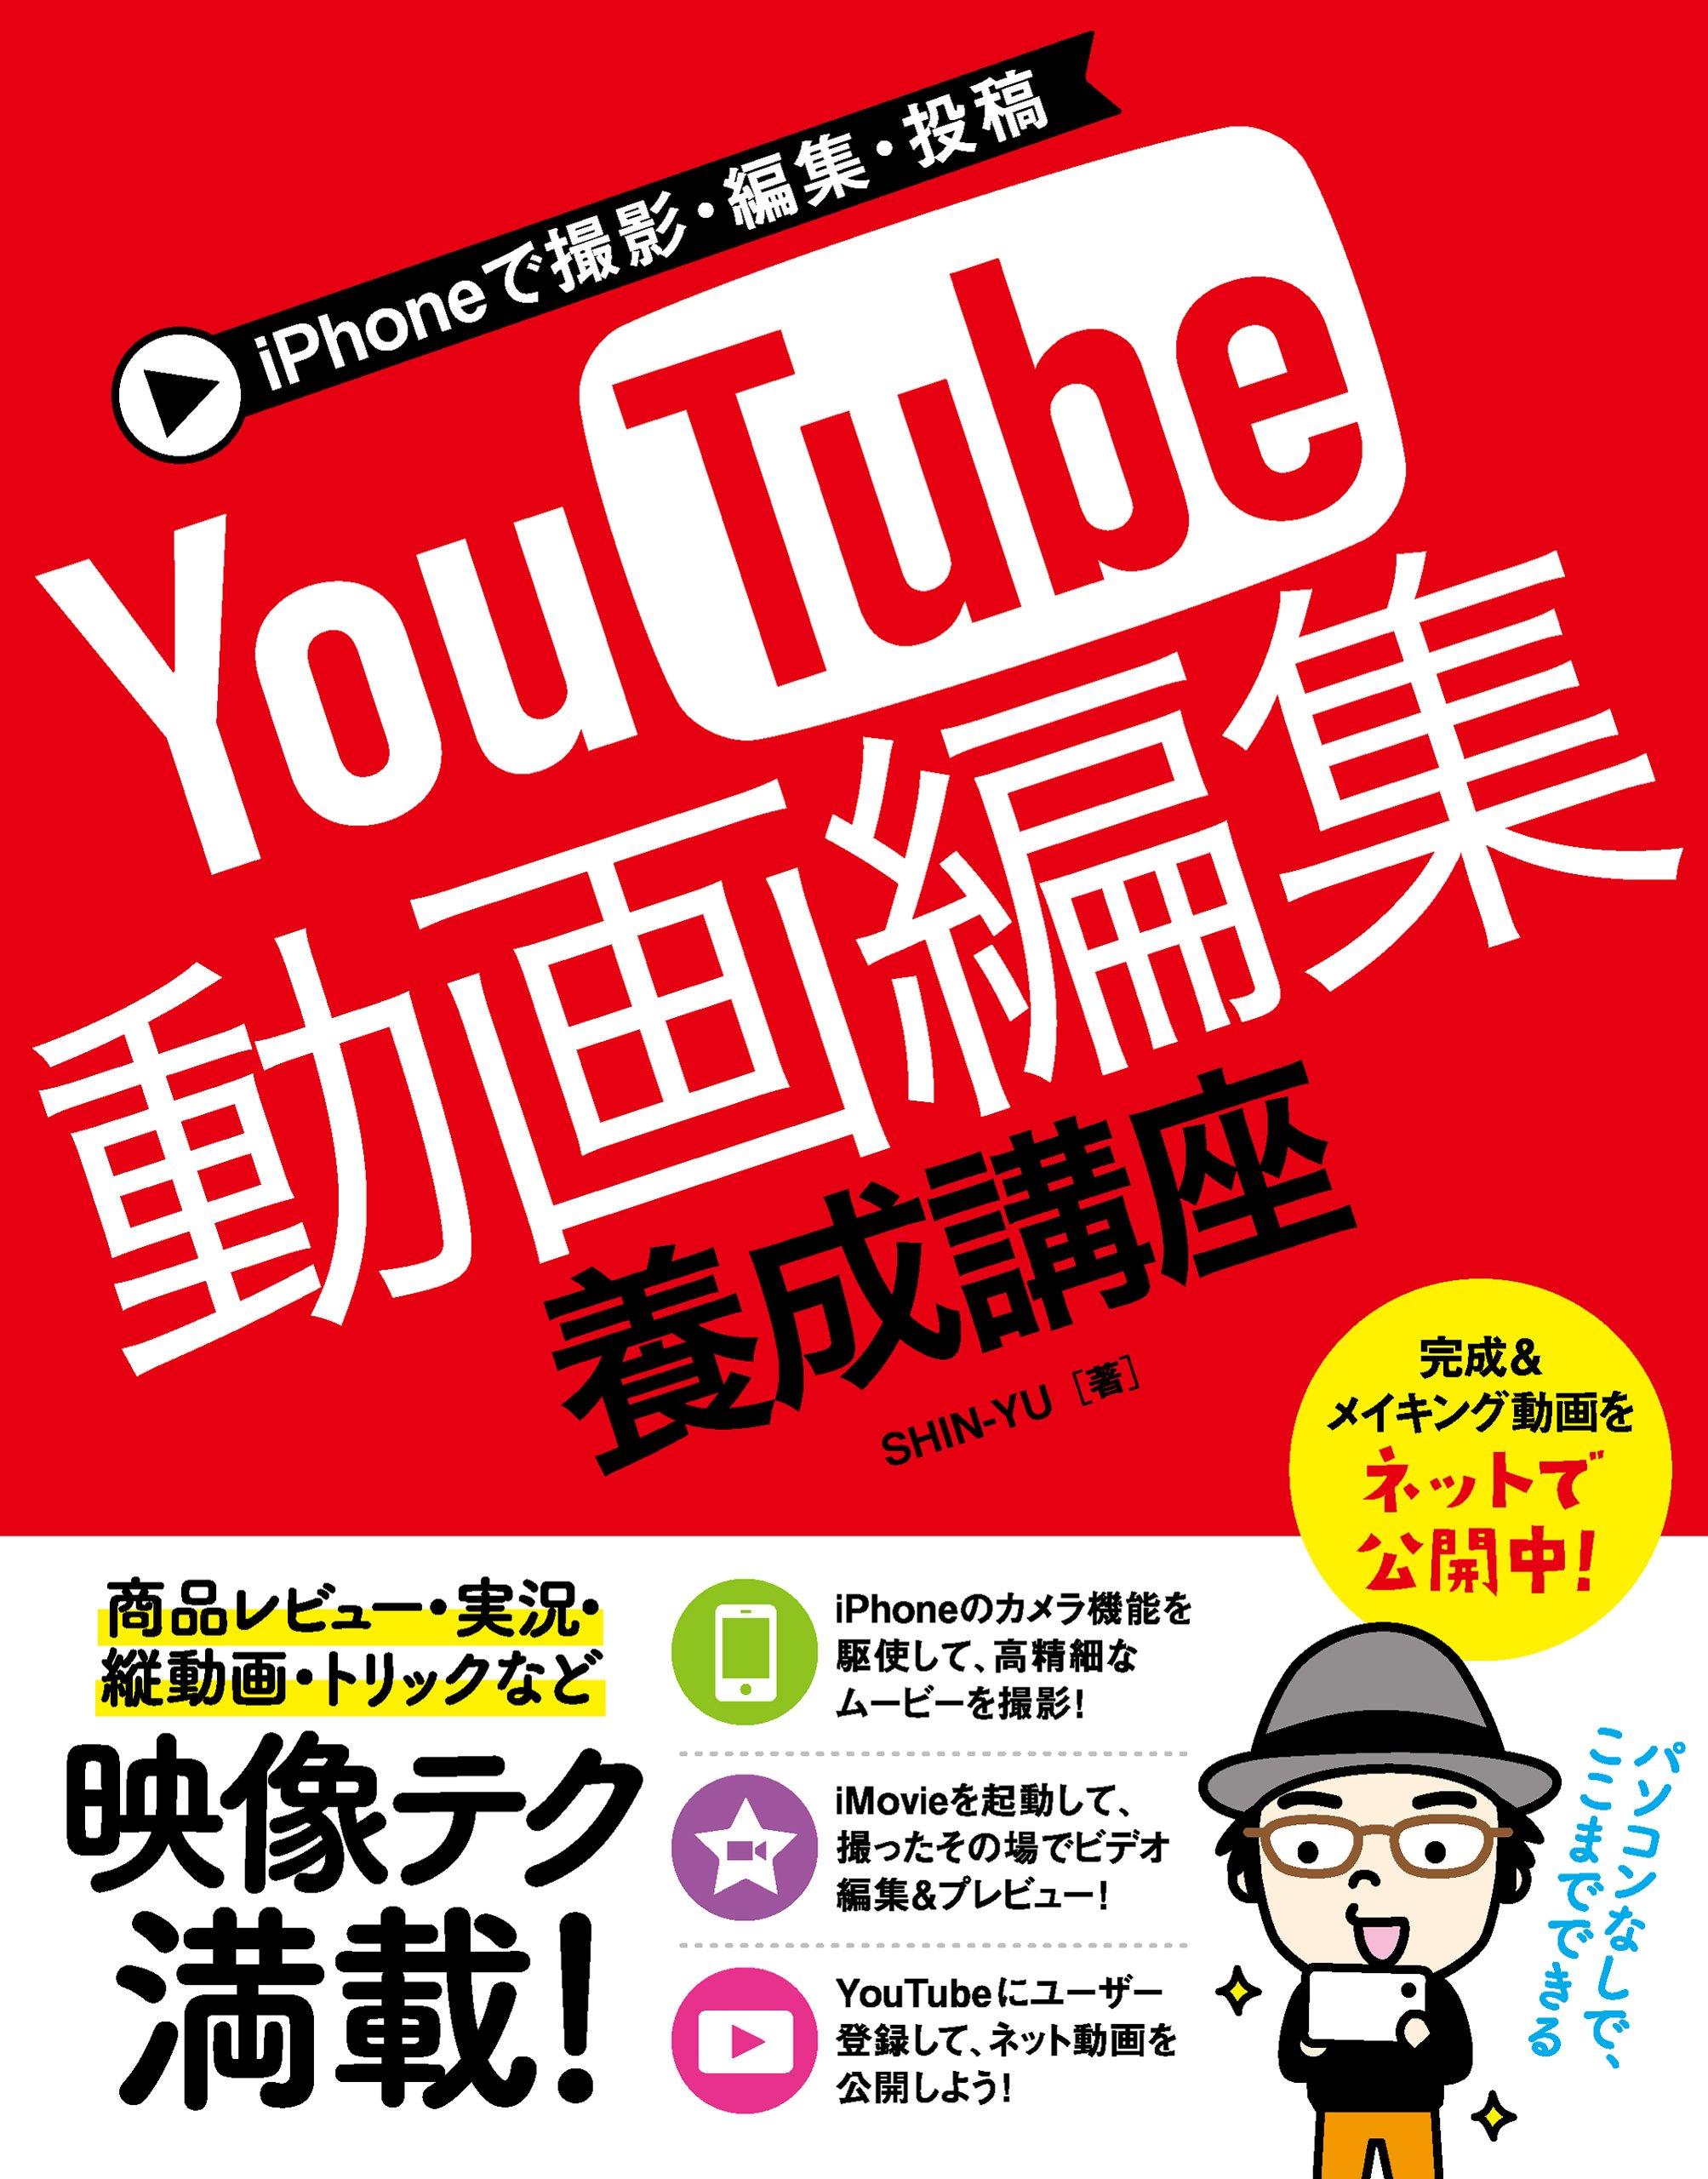 iPhoneで撮影・編集・投稿 YouTube動画編集 養成講座